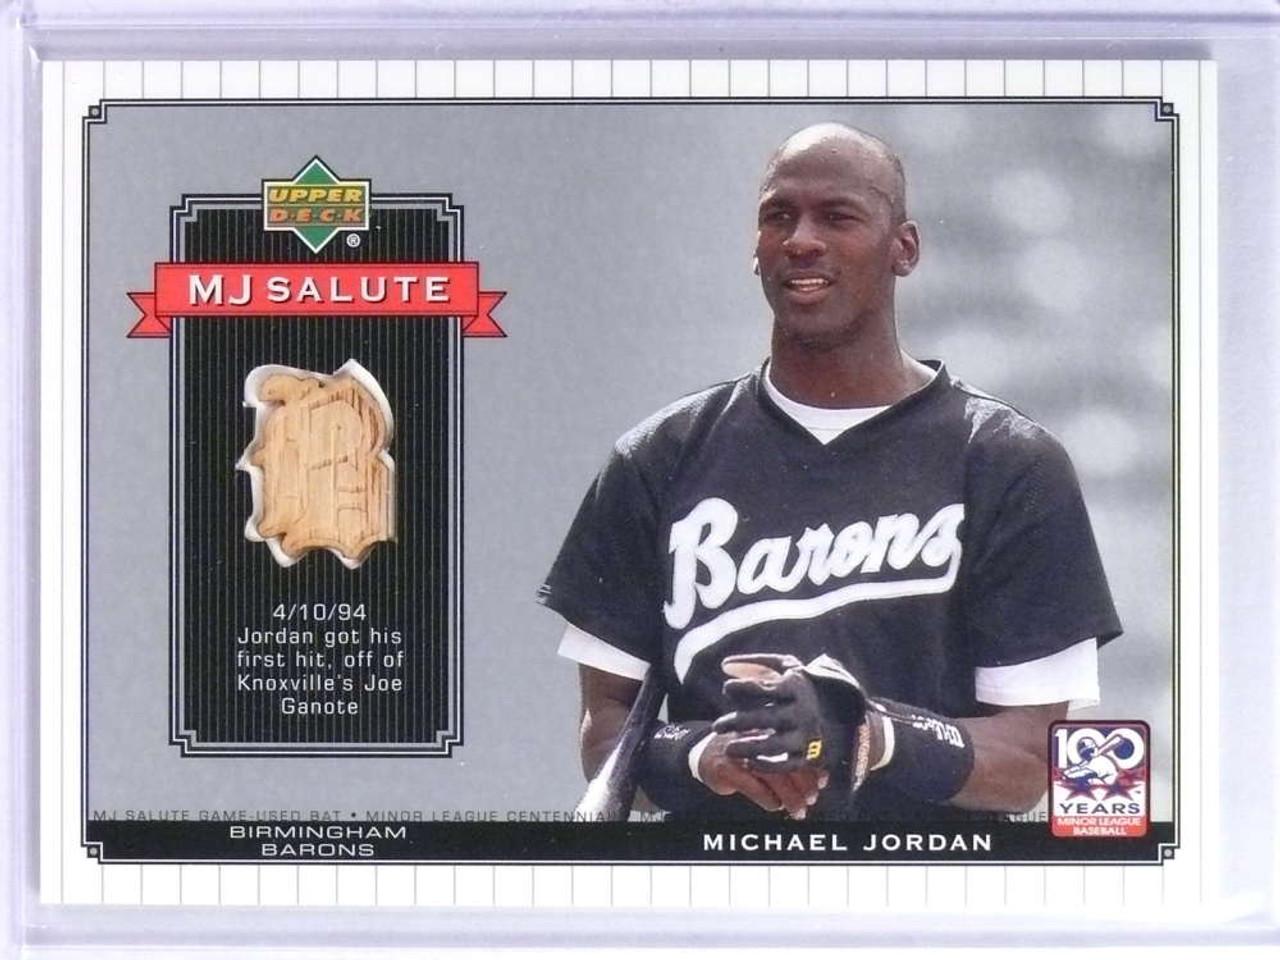 2001 Upper Deck Minors Centennial Mj Michael Jordan Bat Mjb3 75740